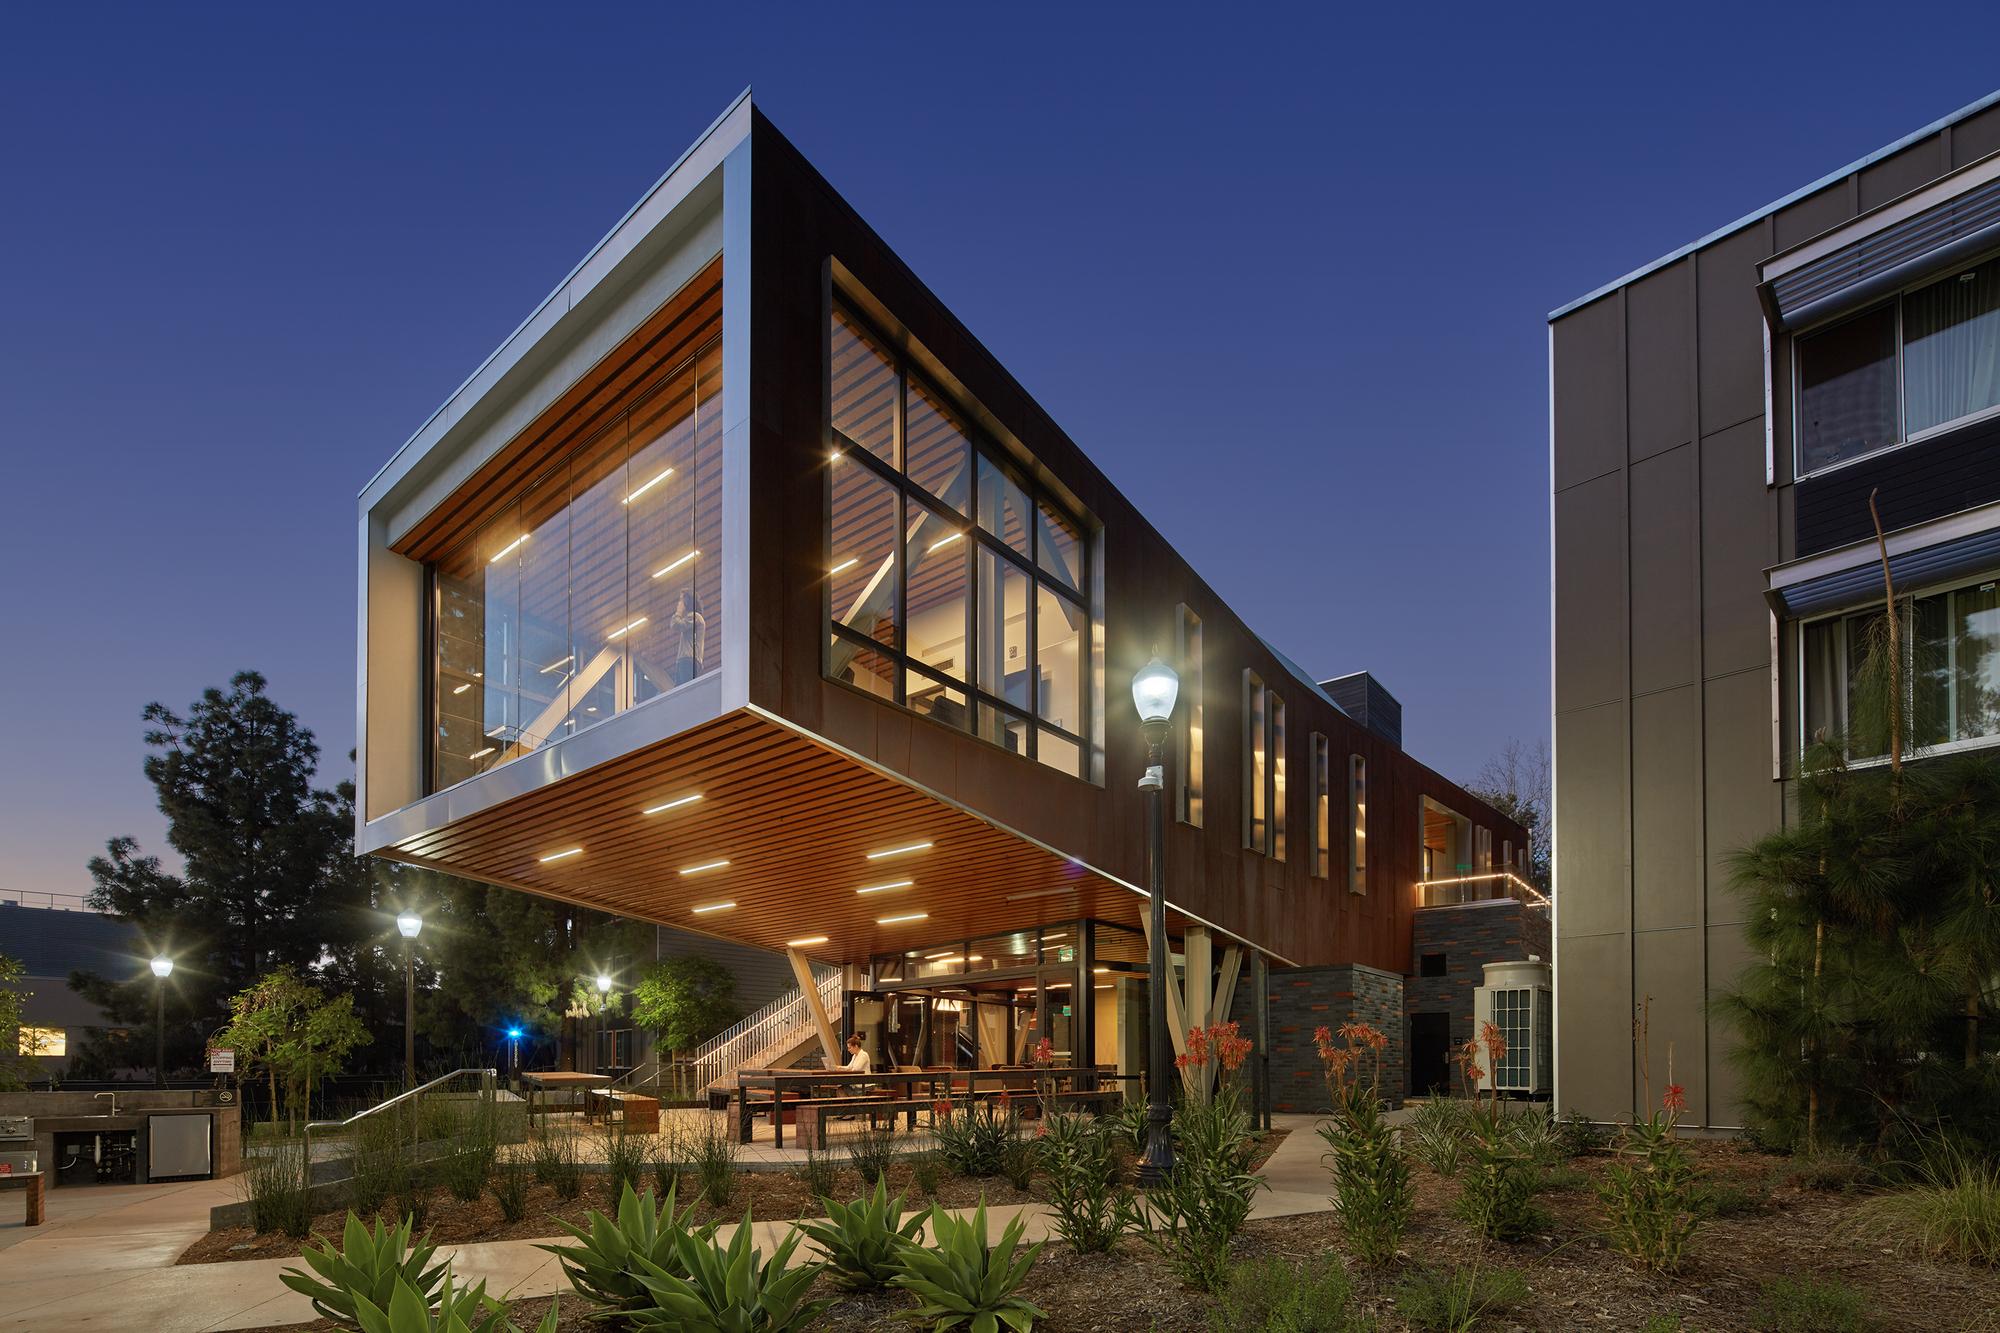 small resolution of ucla saxon suites studio e architects